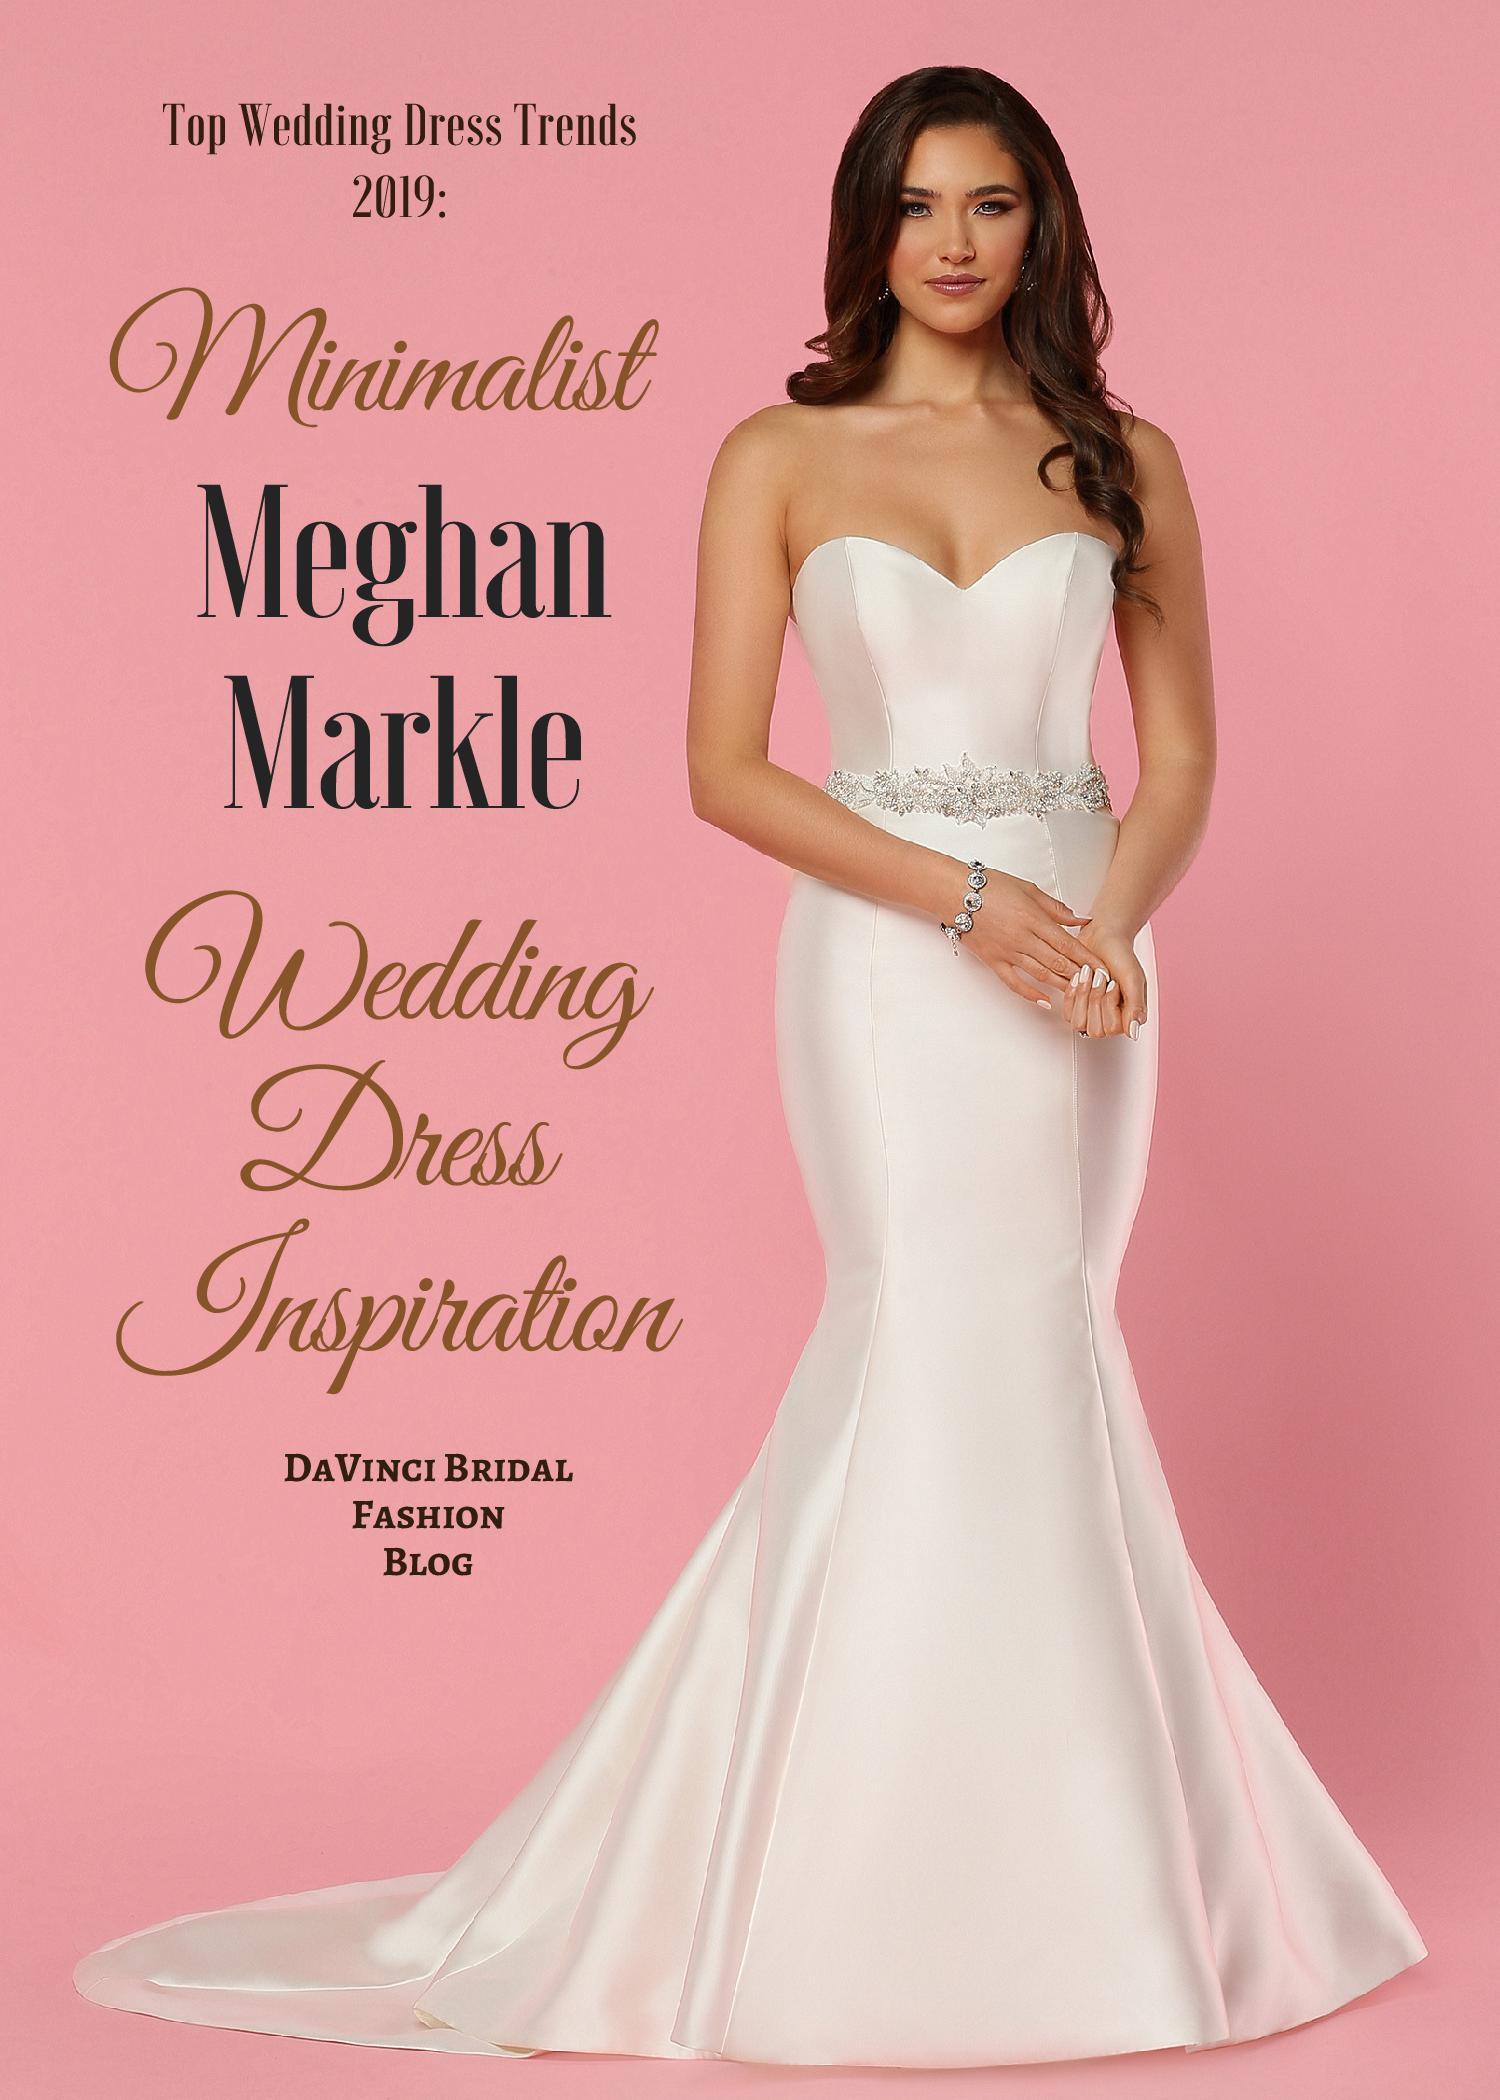 Top Wedding Dress Trends For 2019 Meghan Markle Wedding Dress